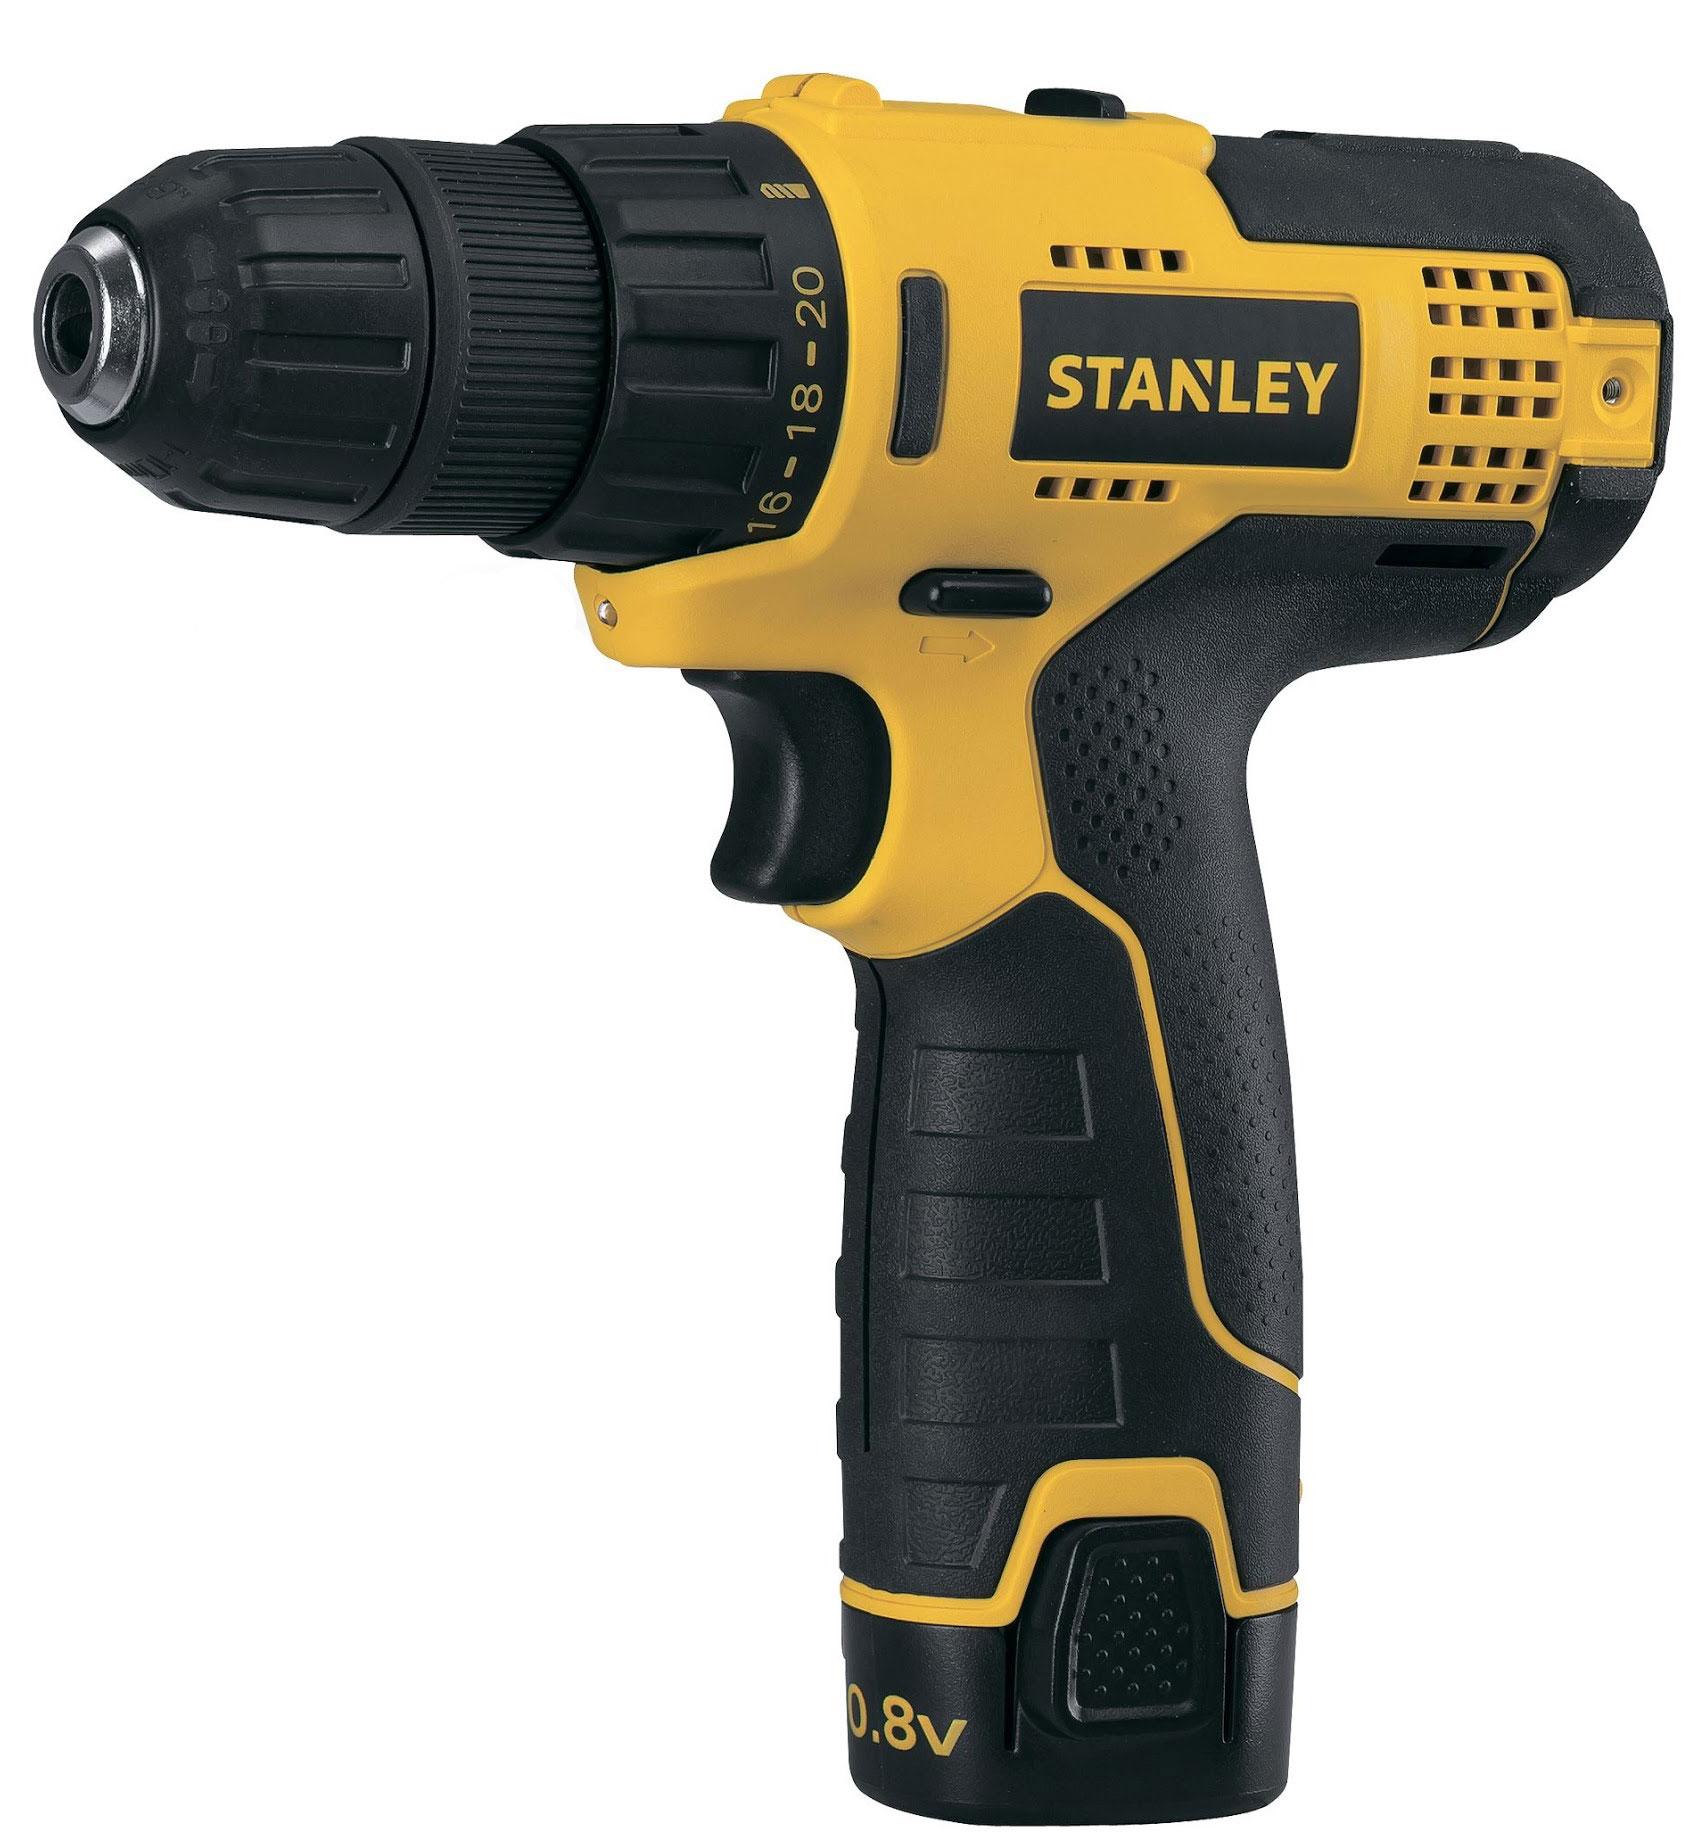 Stanley STCD1081B2-RU - дрель-шуруповерт (Yellow)  STCD1081B2-RU